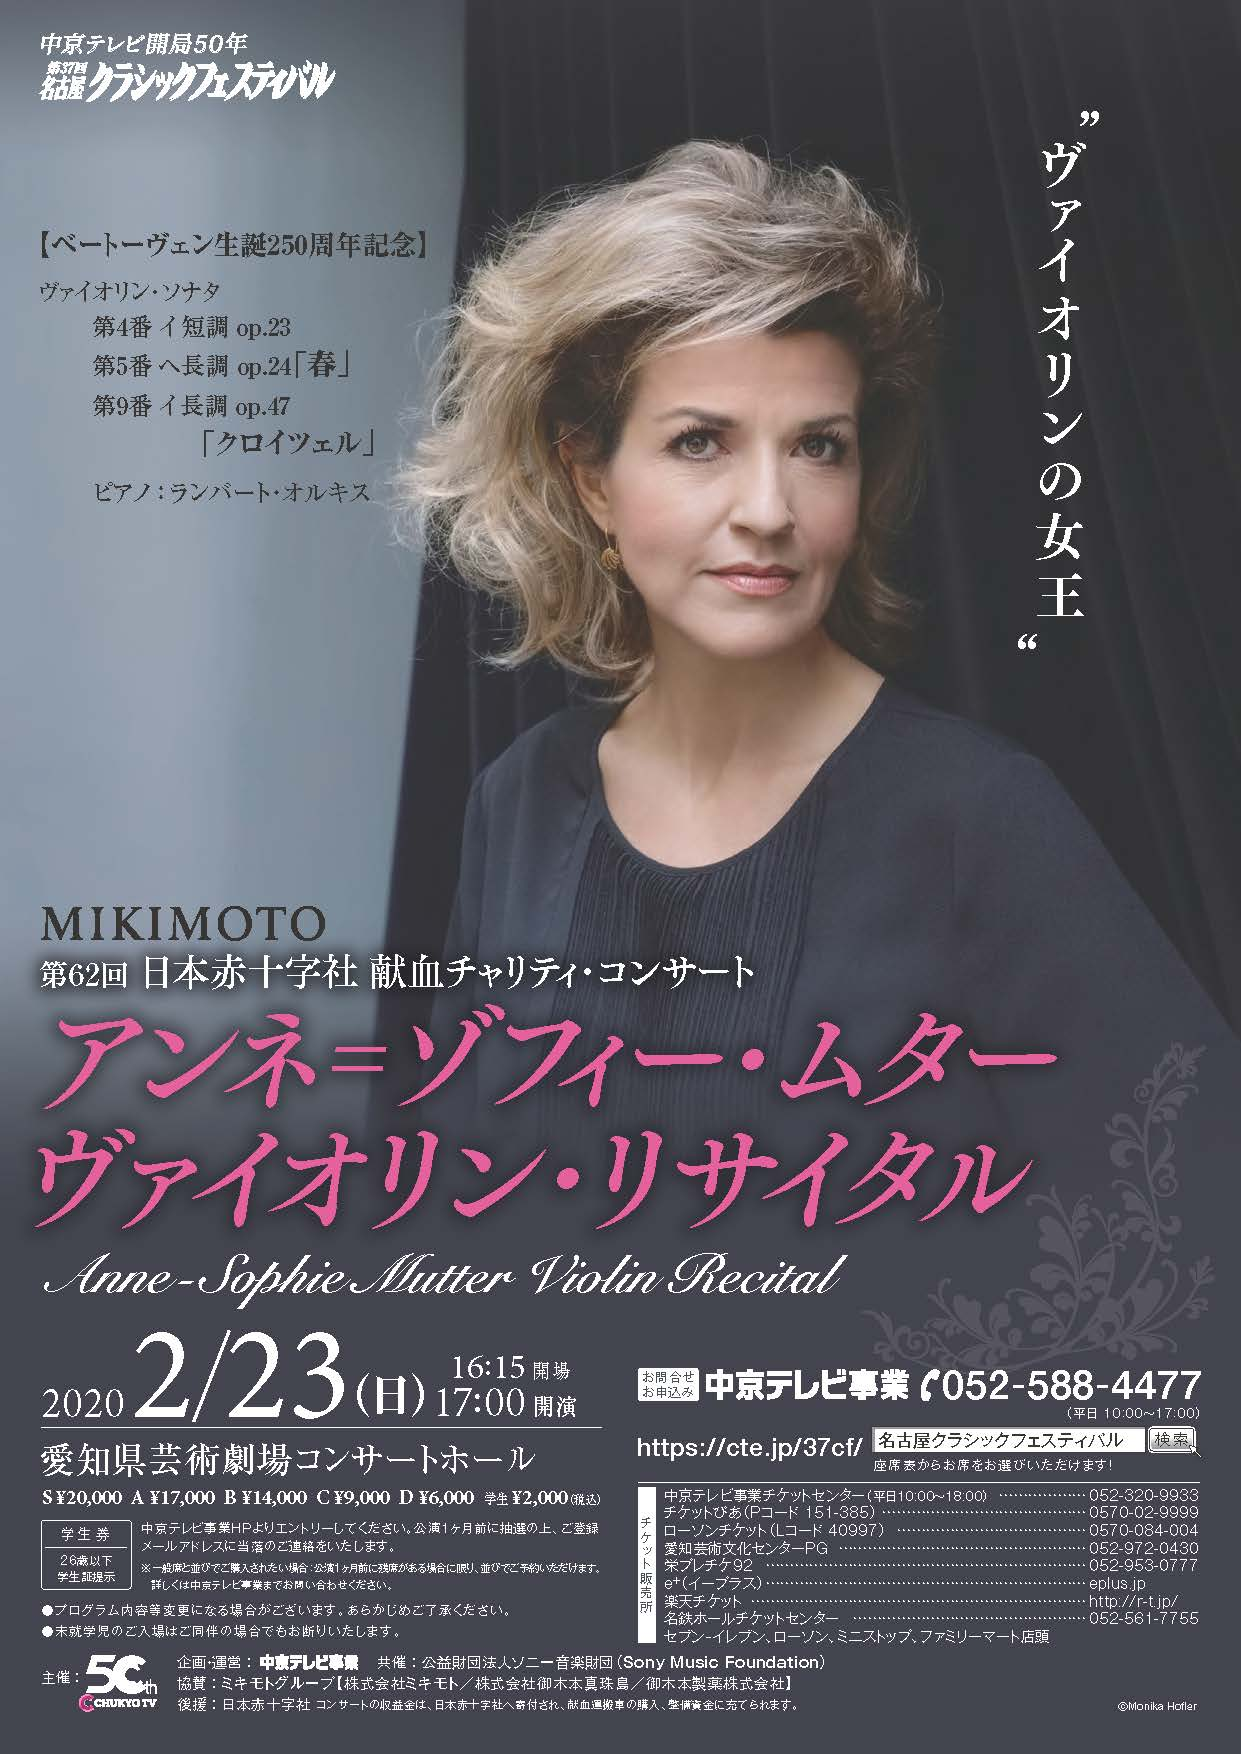 MIKIMOTO 第62回 日本赤十字社 献血チャリティ・コンサート アンネ=ゾフィー・ムター ヴァイオリン・リサイタル